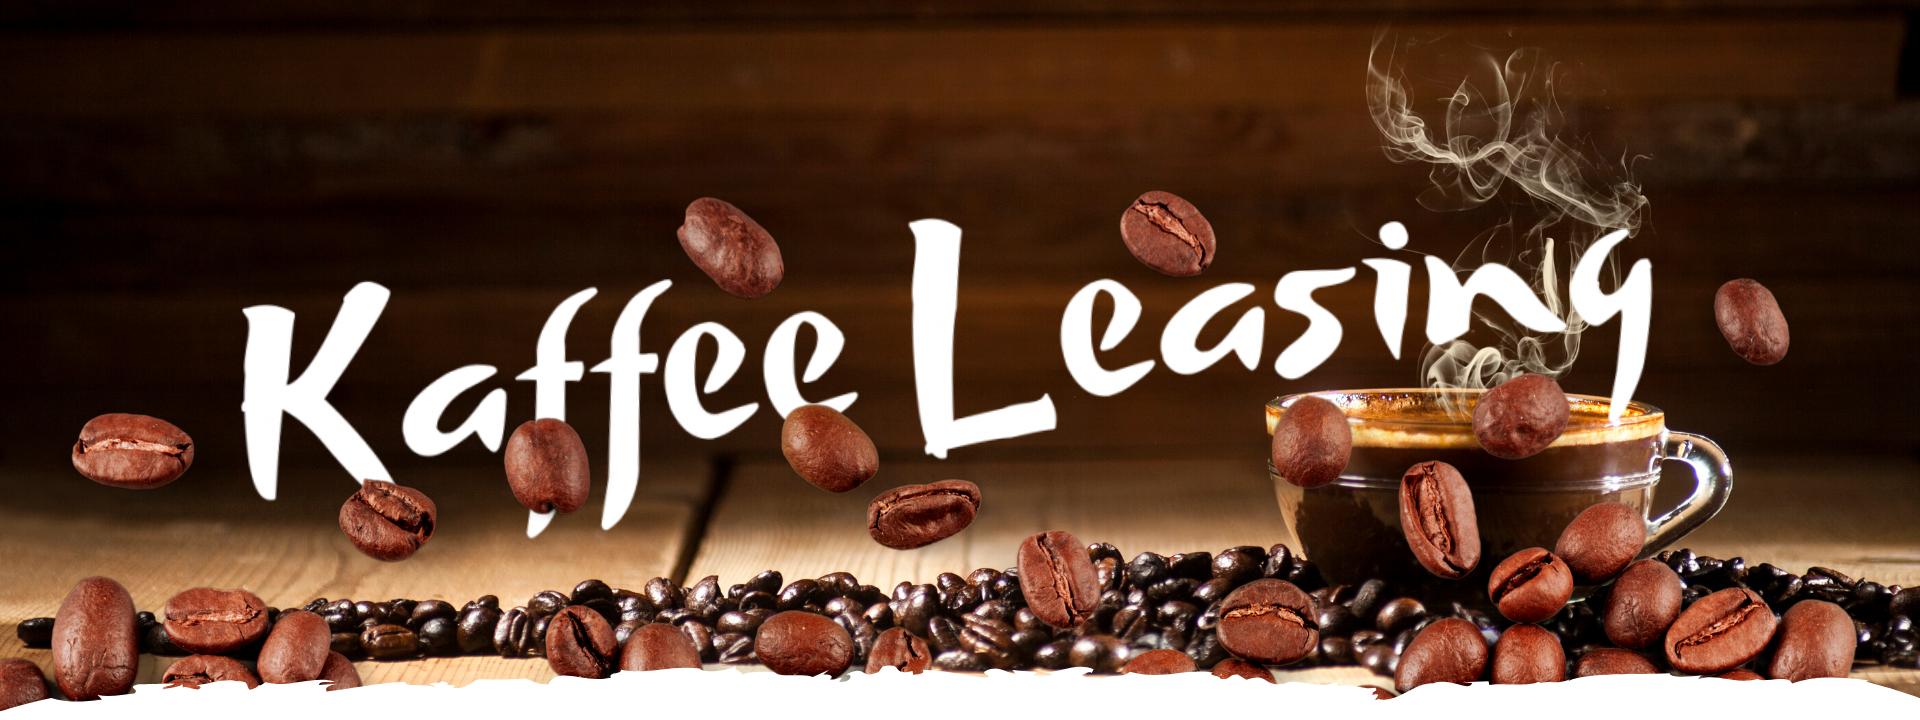 kaffeeleasing-com-trier1